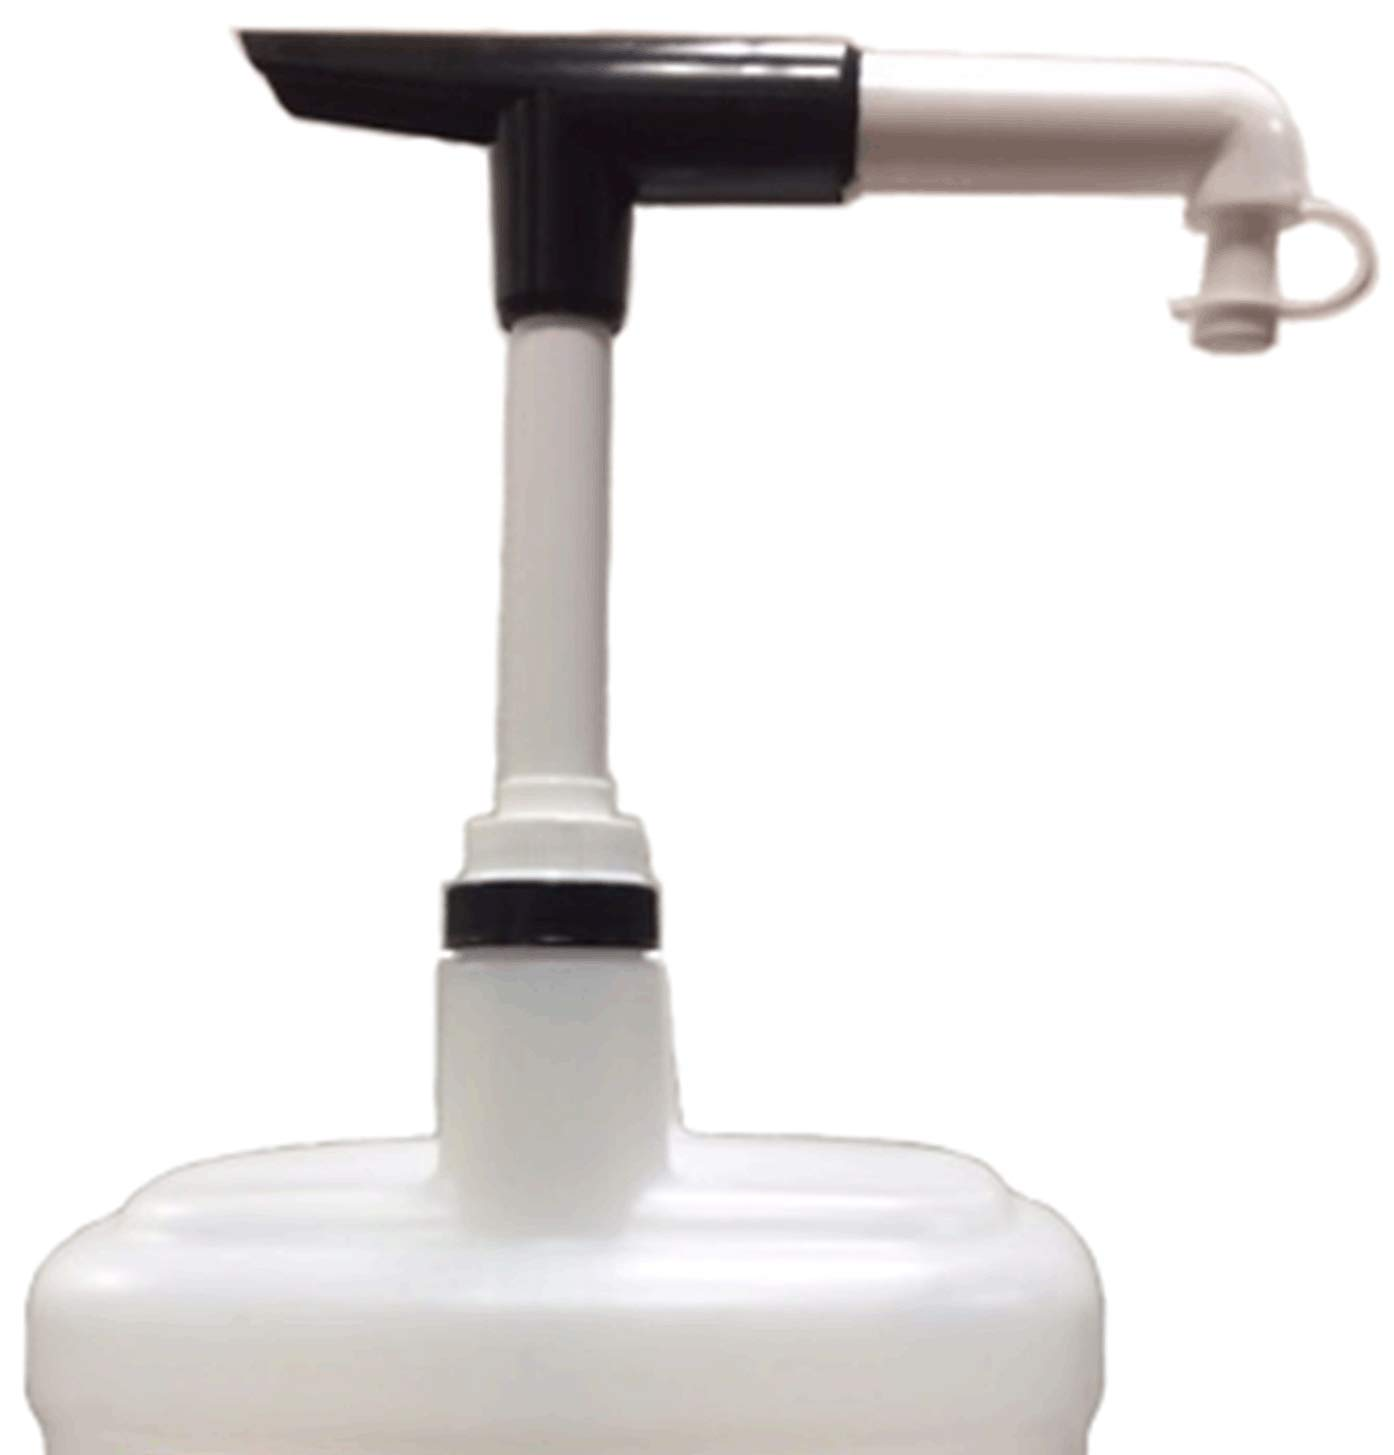 Titebond 60015 Wood Glue Pump ... (1)